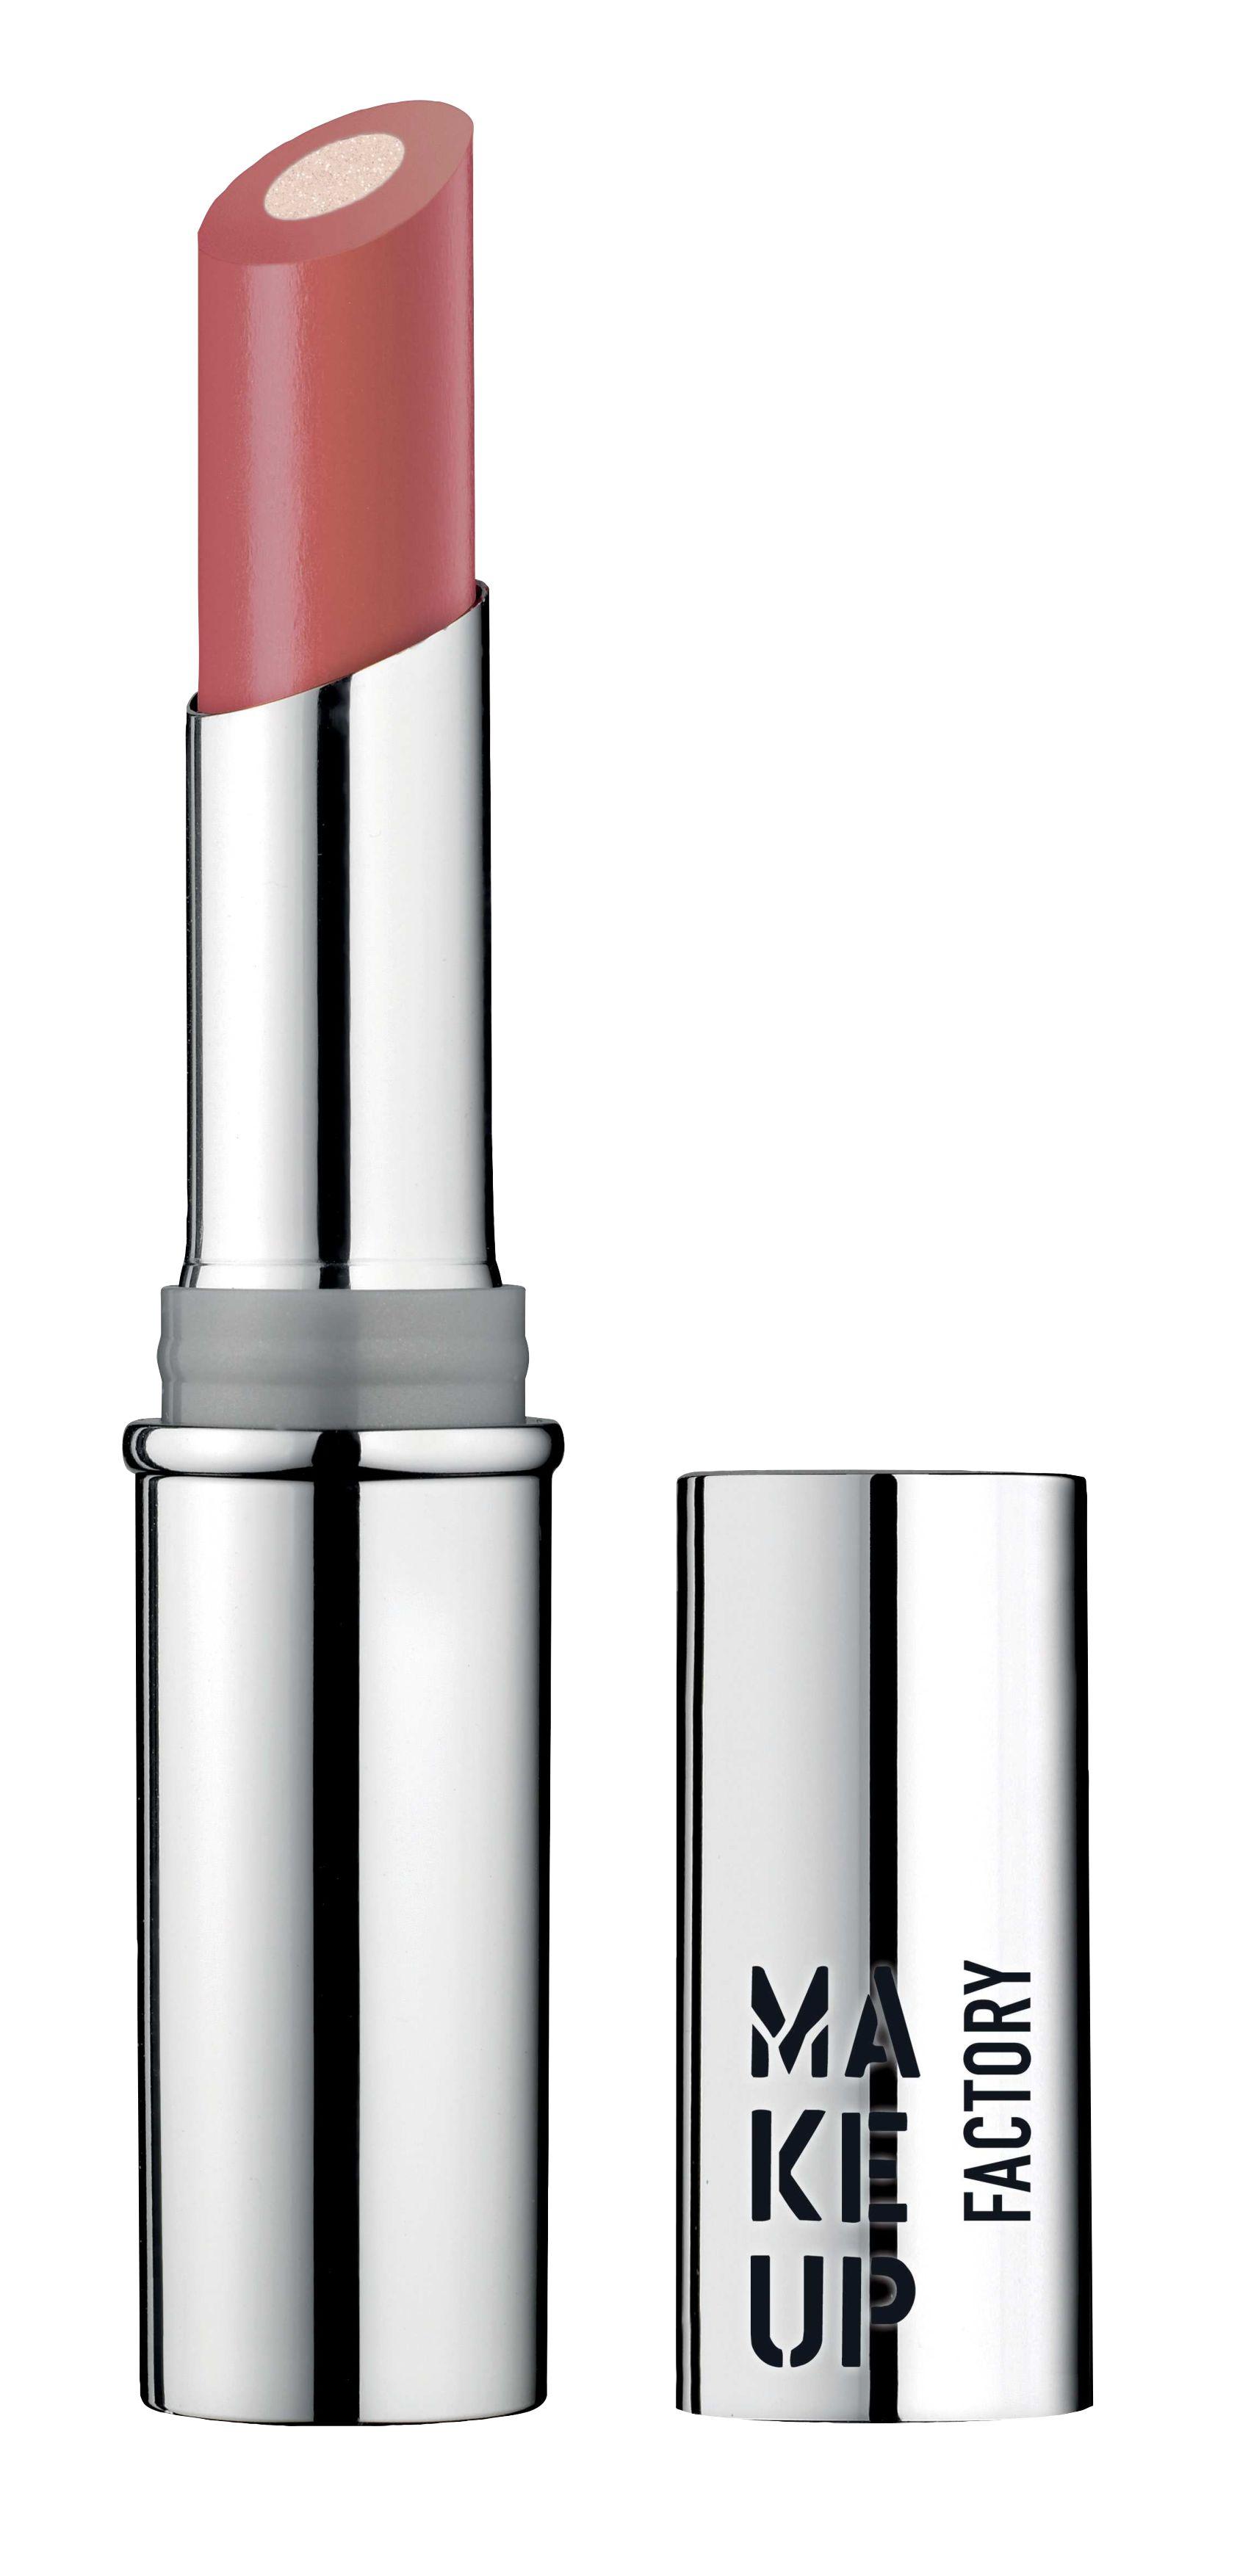 MAKE UP FACTORY Помада губная с мерцающим стержнем, 13 красная Сахара / Inner Glow Lip Color 3 г фото